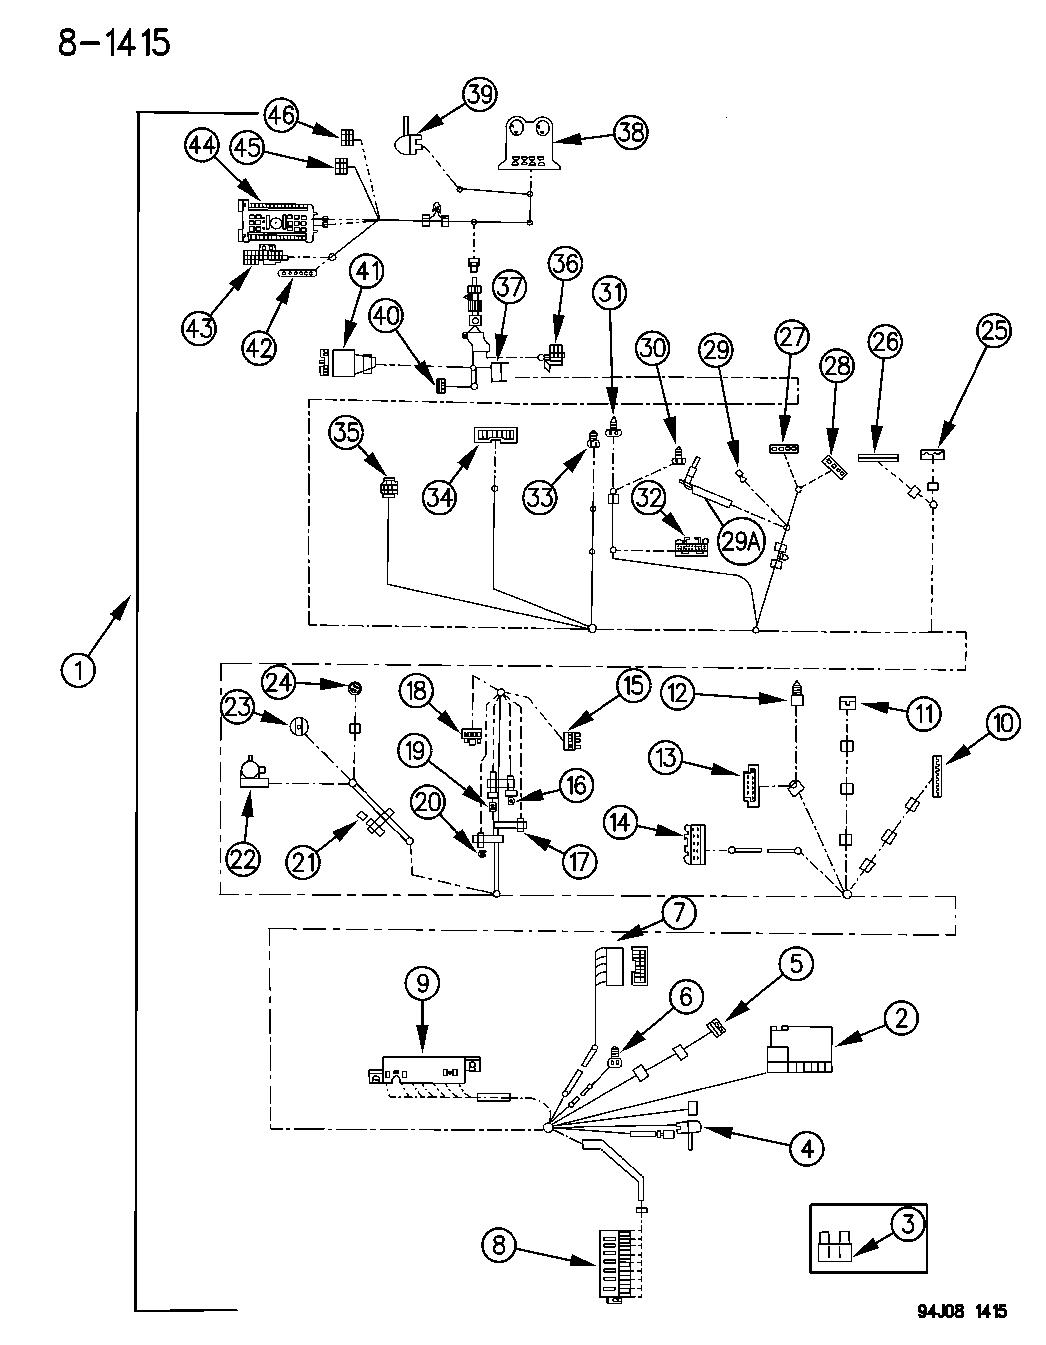 Jeep Grand Cherokee Wiring